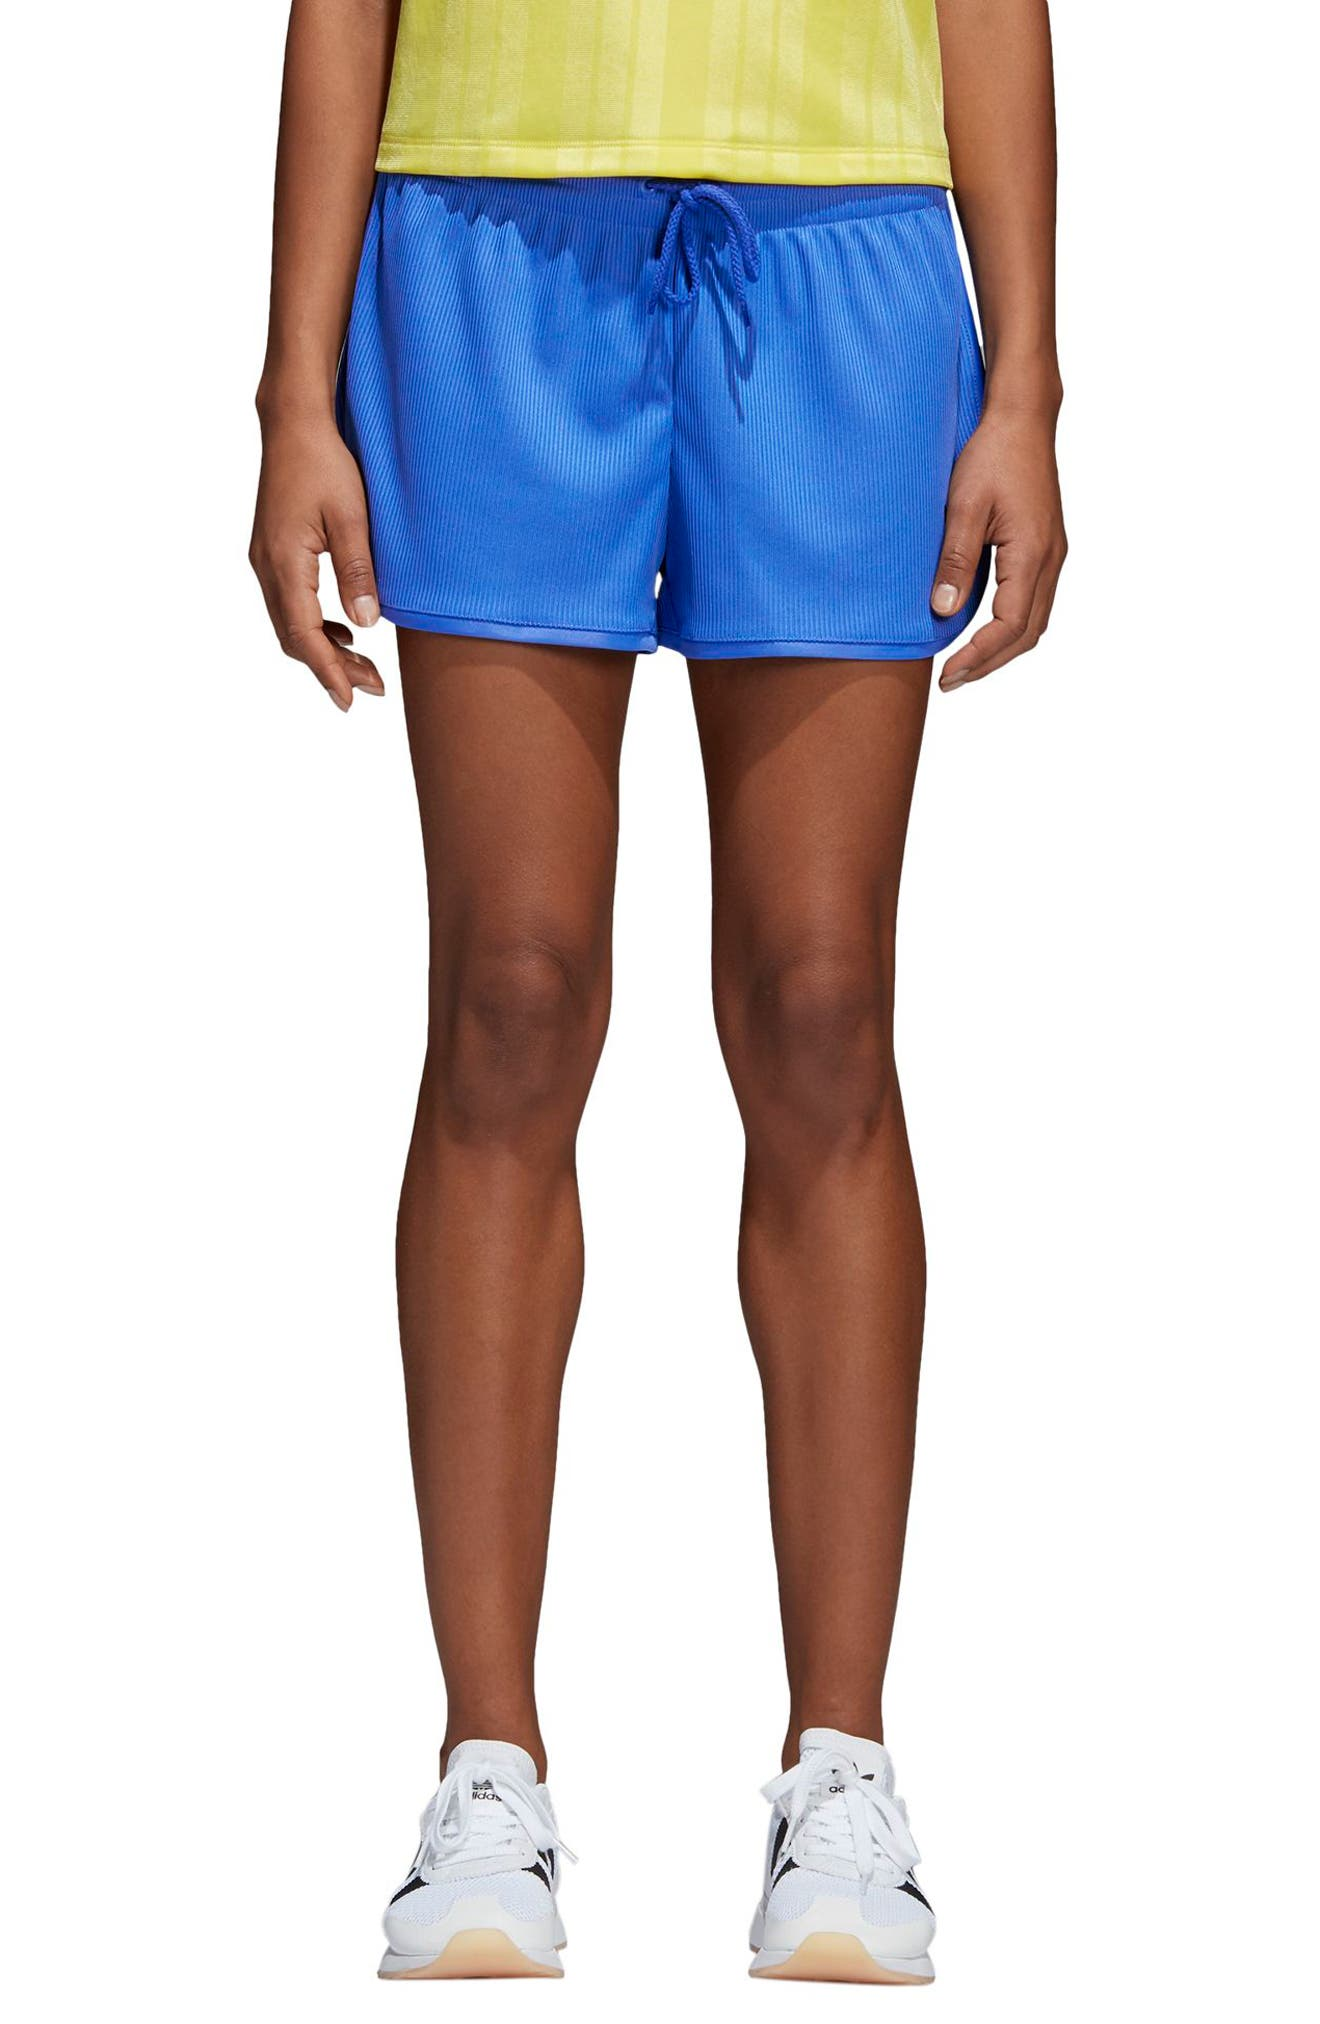 Originals Fashion League Shorts,                             Main thumbnail 1, color,                             Hi-Res Blue